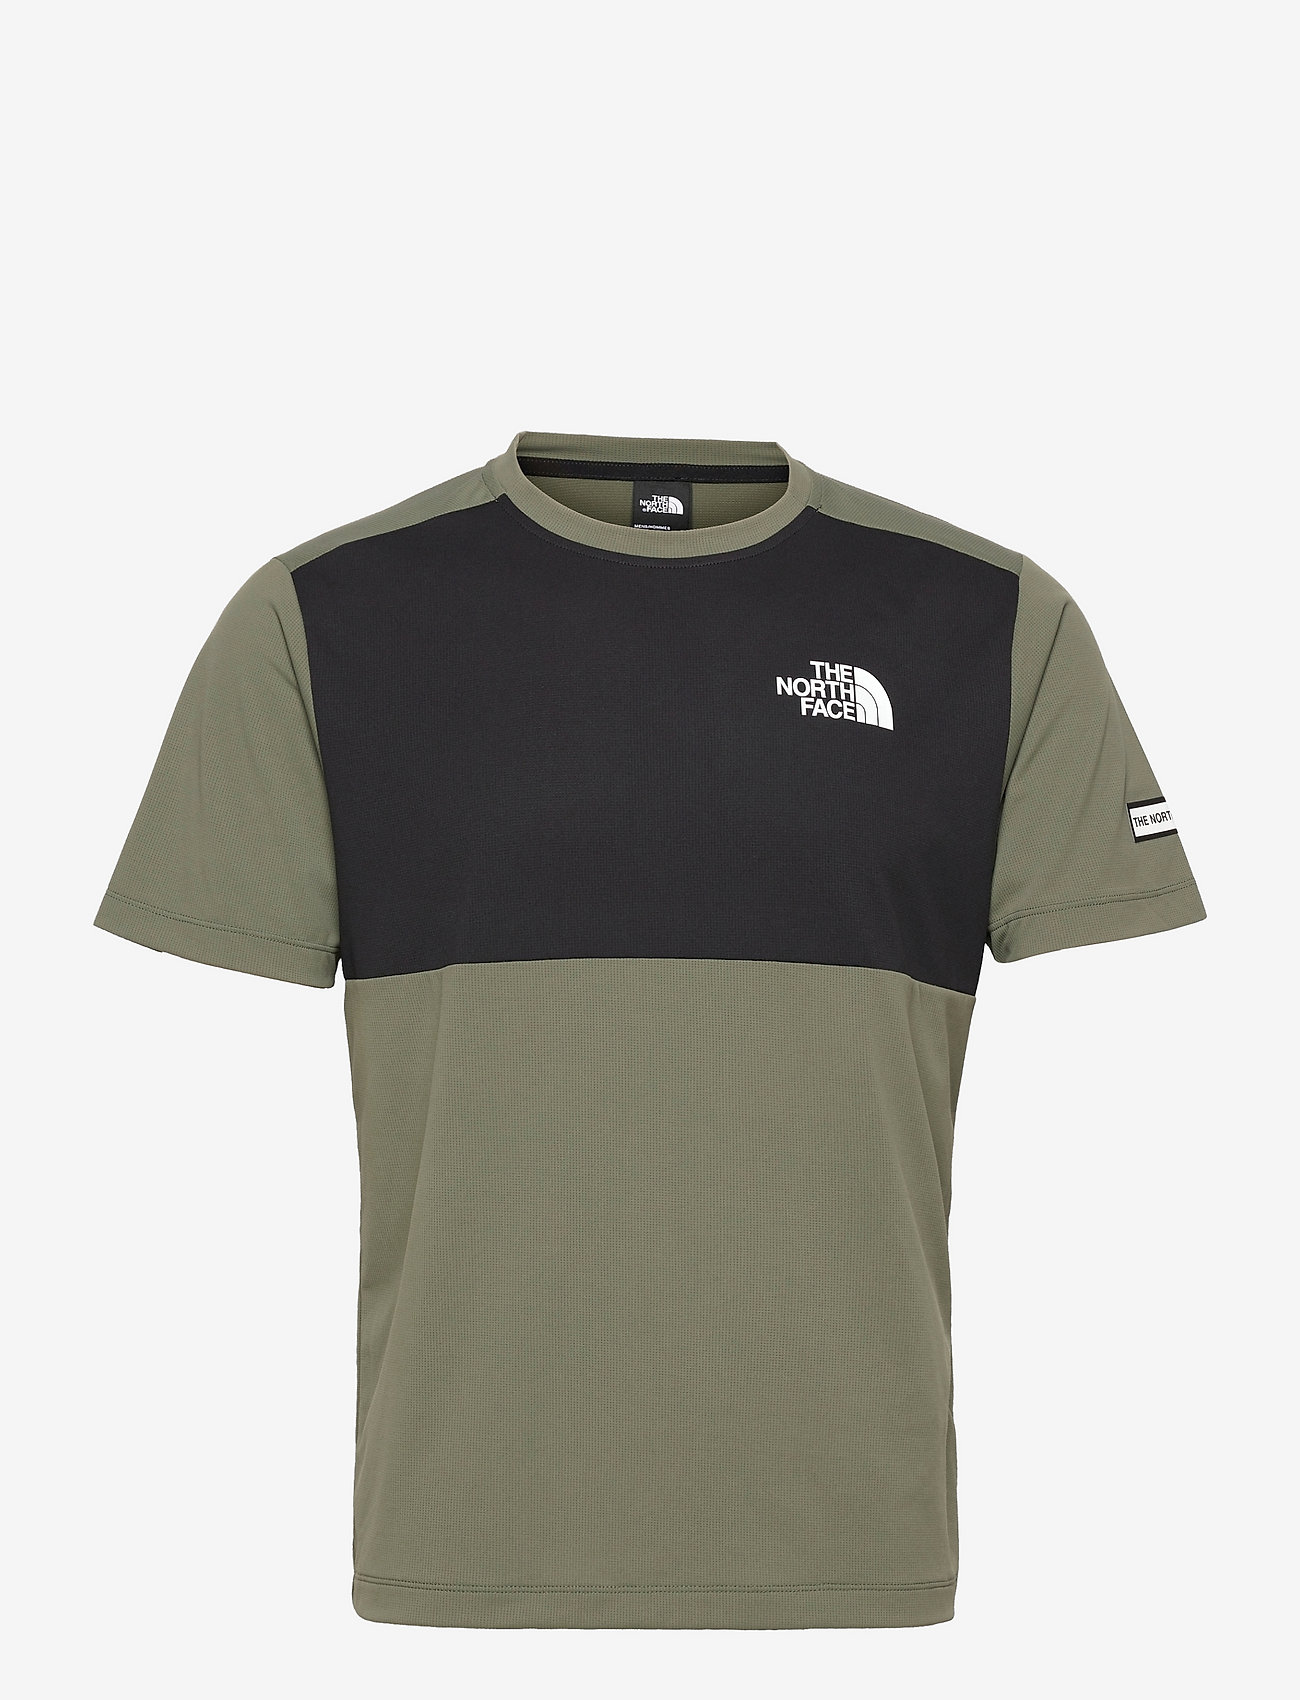 The North Face - M MA HYBD SS TEE - EU - t-shirts - thyme/tnf black - 0